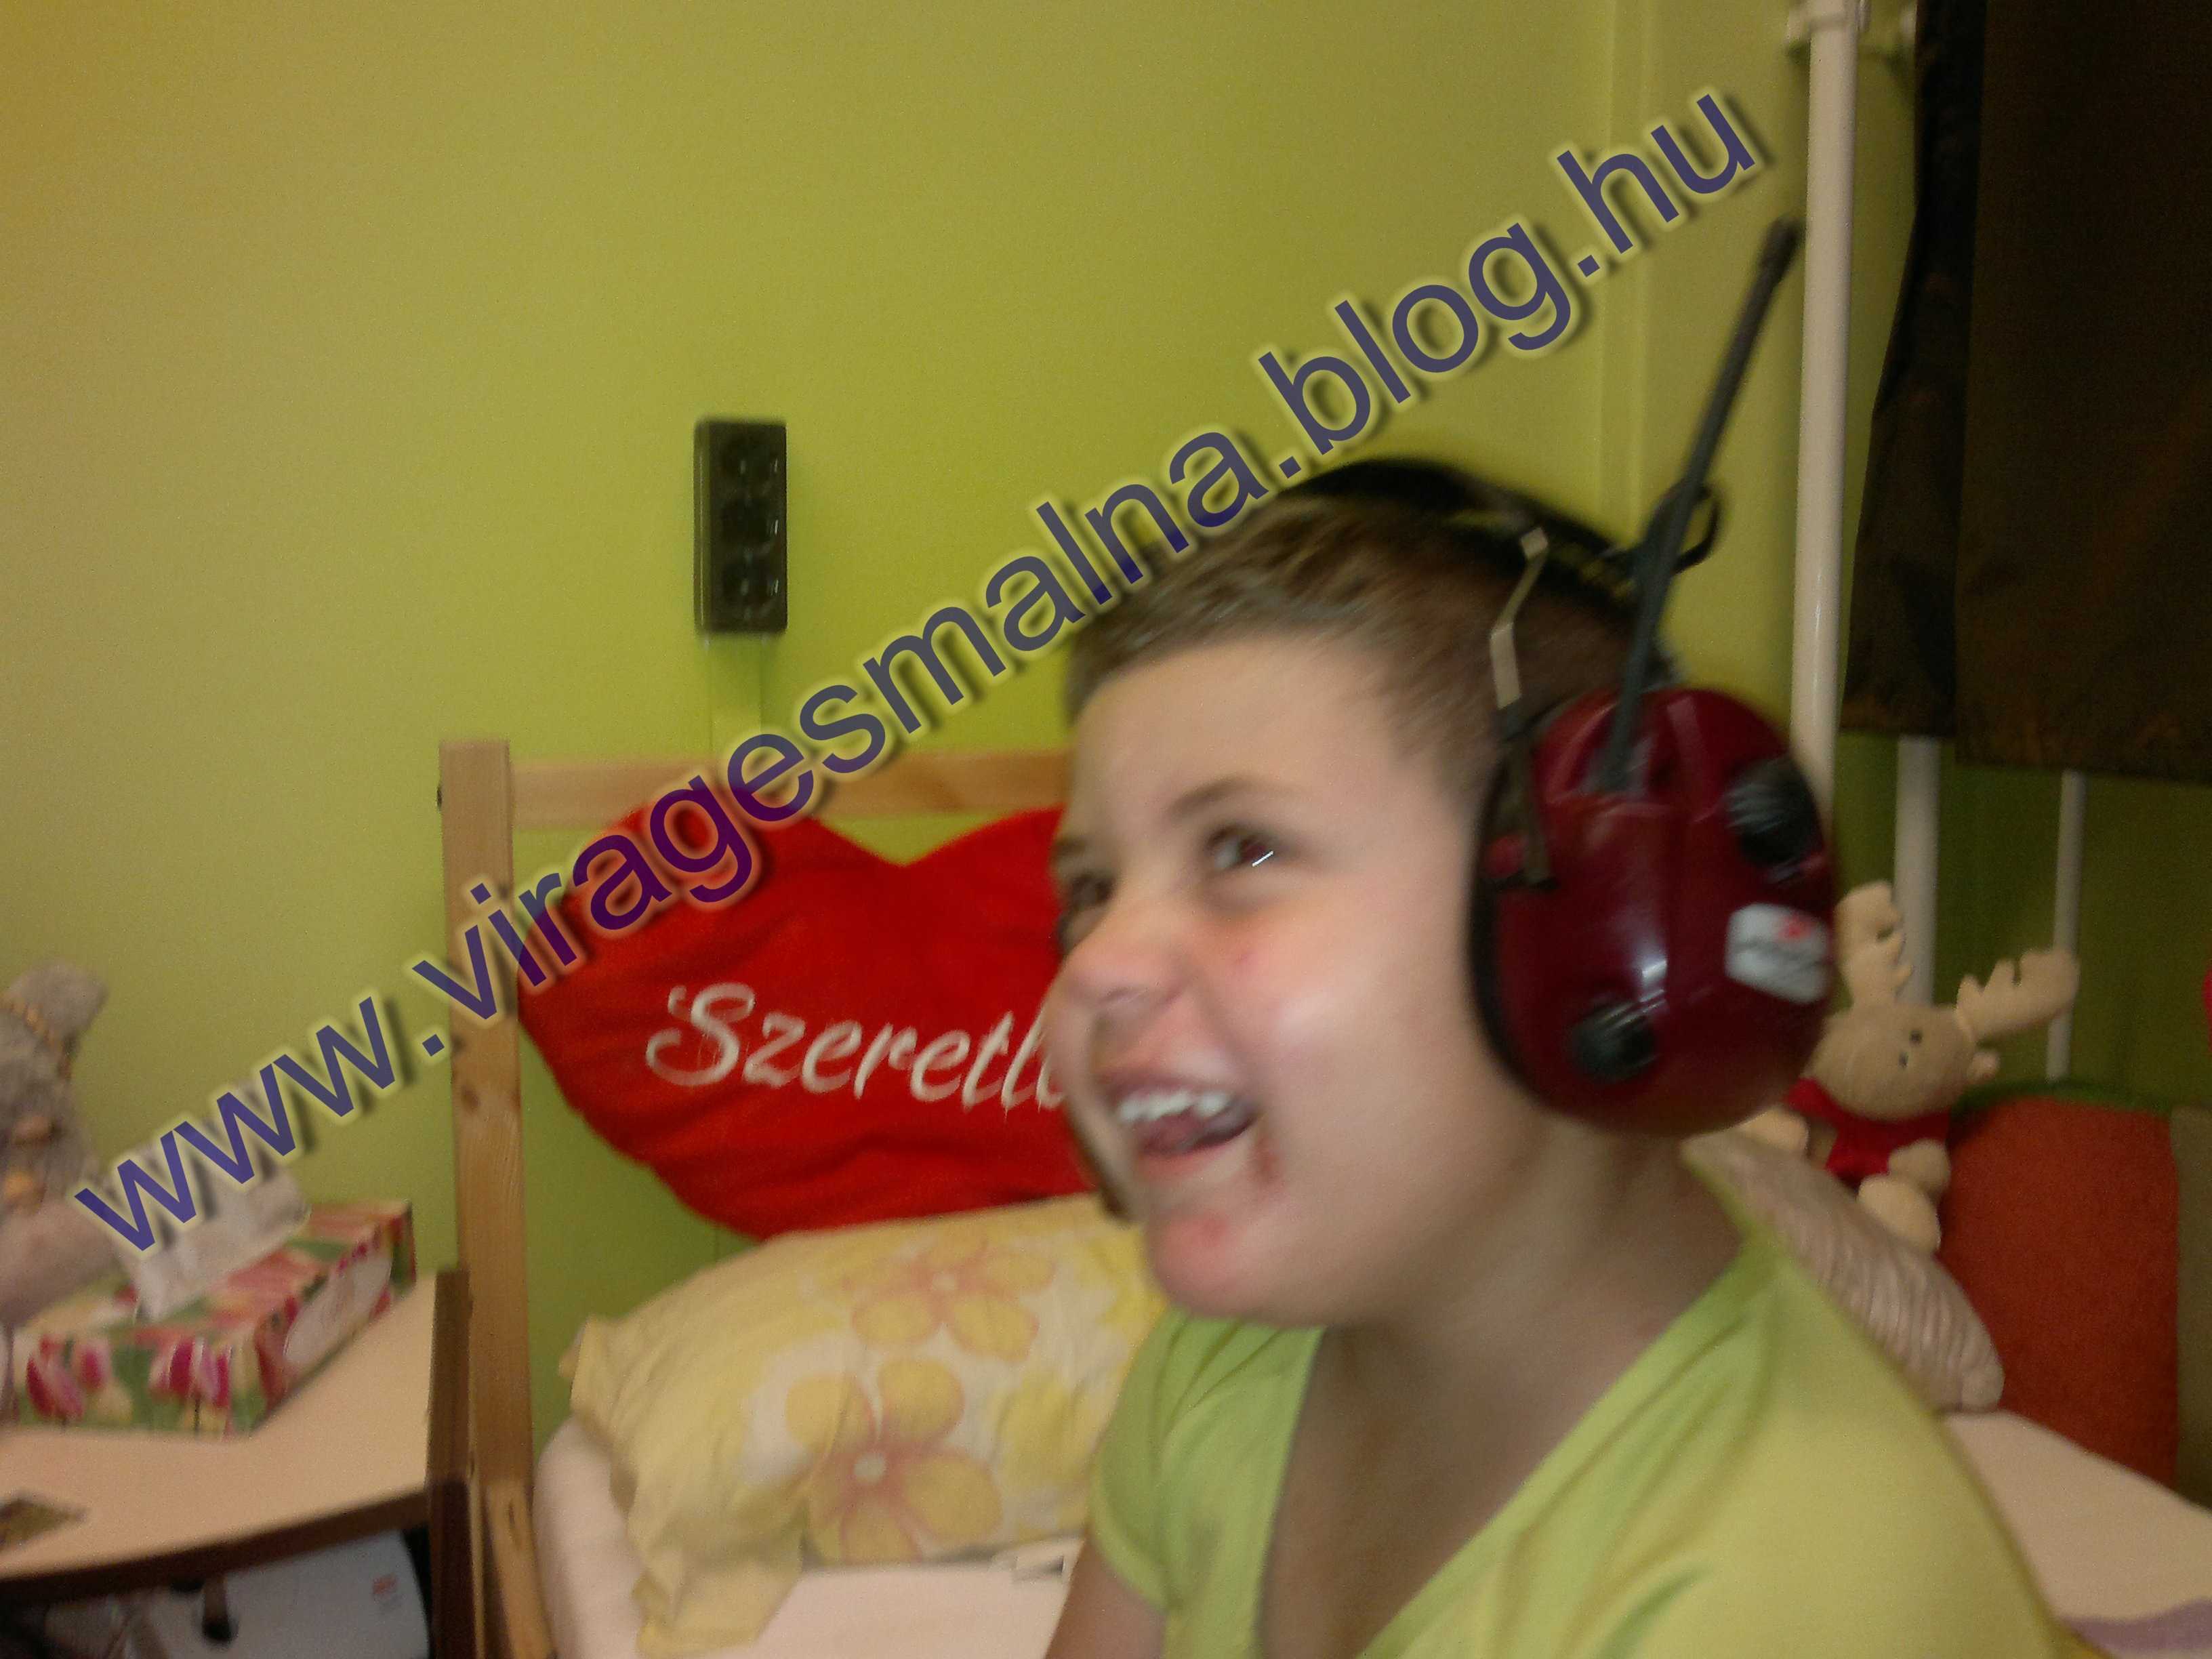 2012-06-28-276_1340907499.jpg_3264x2448